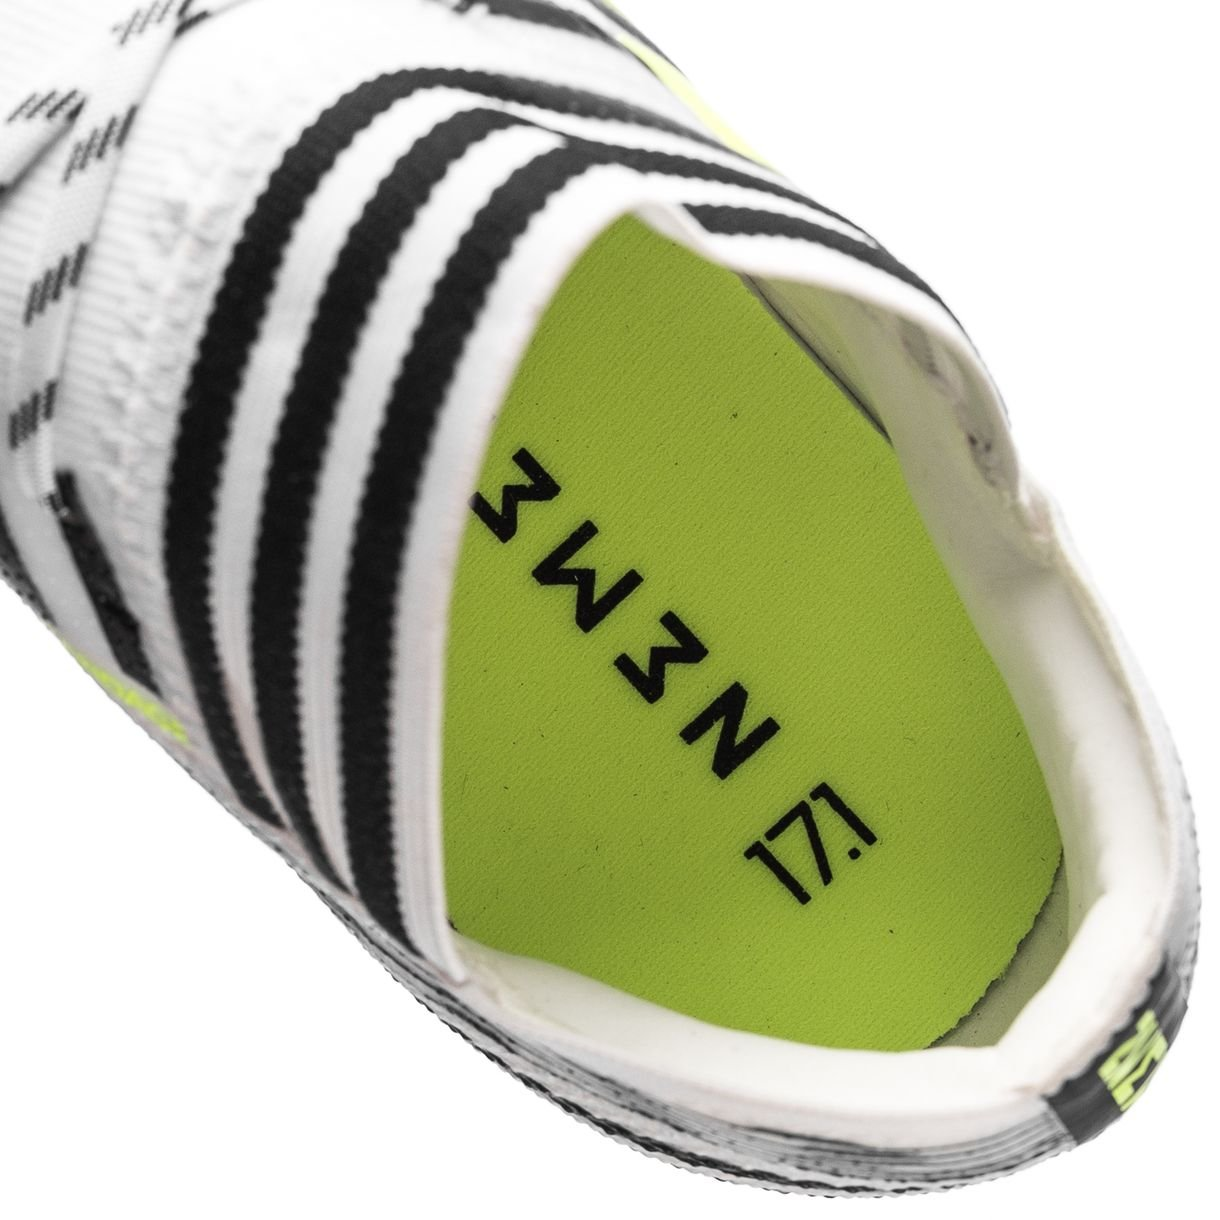 Football shoes adidas NEMEZIZ 17.1 FG J